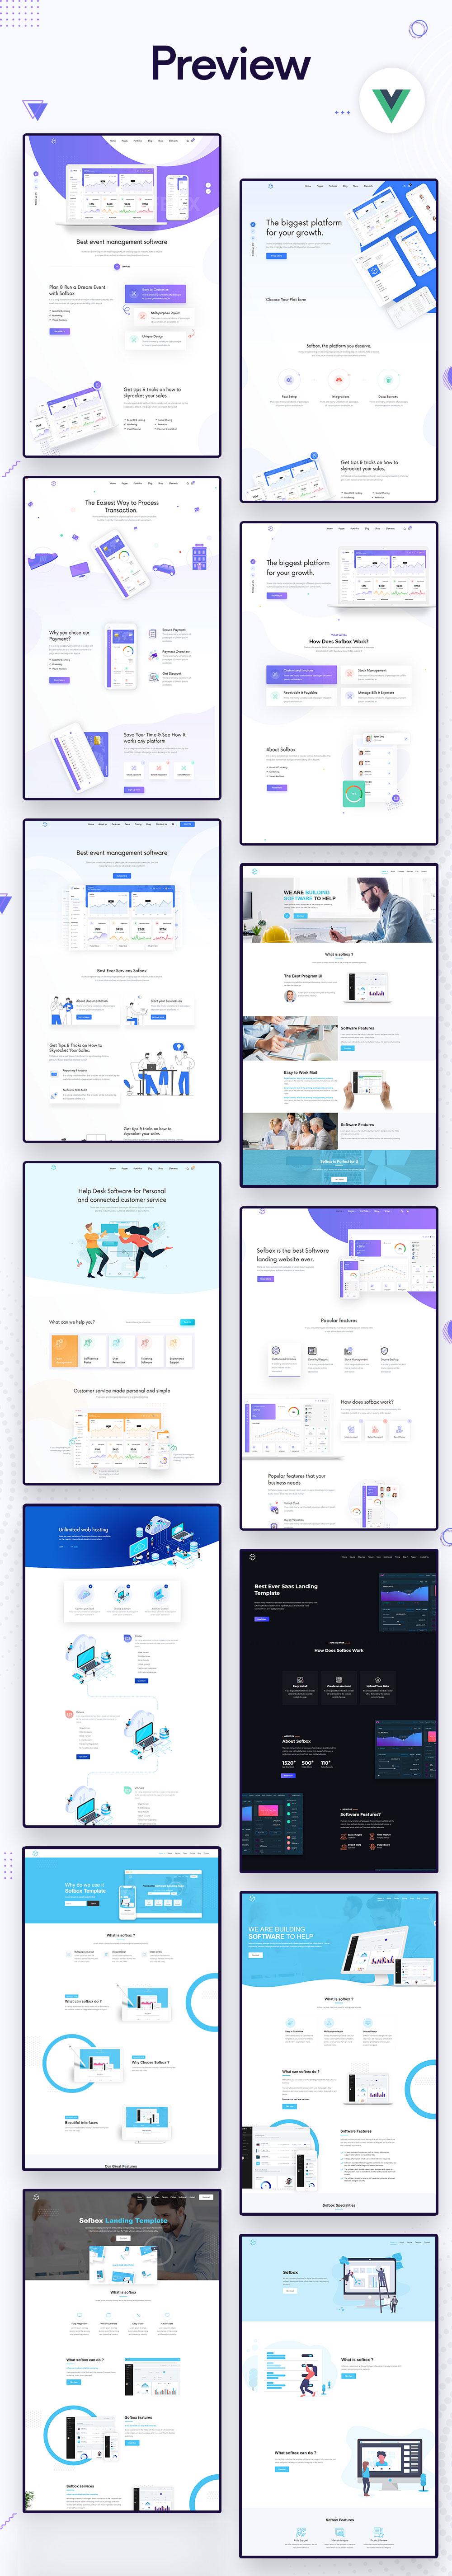 Sofbox - Vue JS Software Landing Page - 2 vue js software landing page Sofbox preview vue